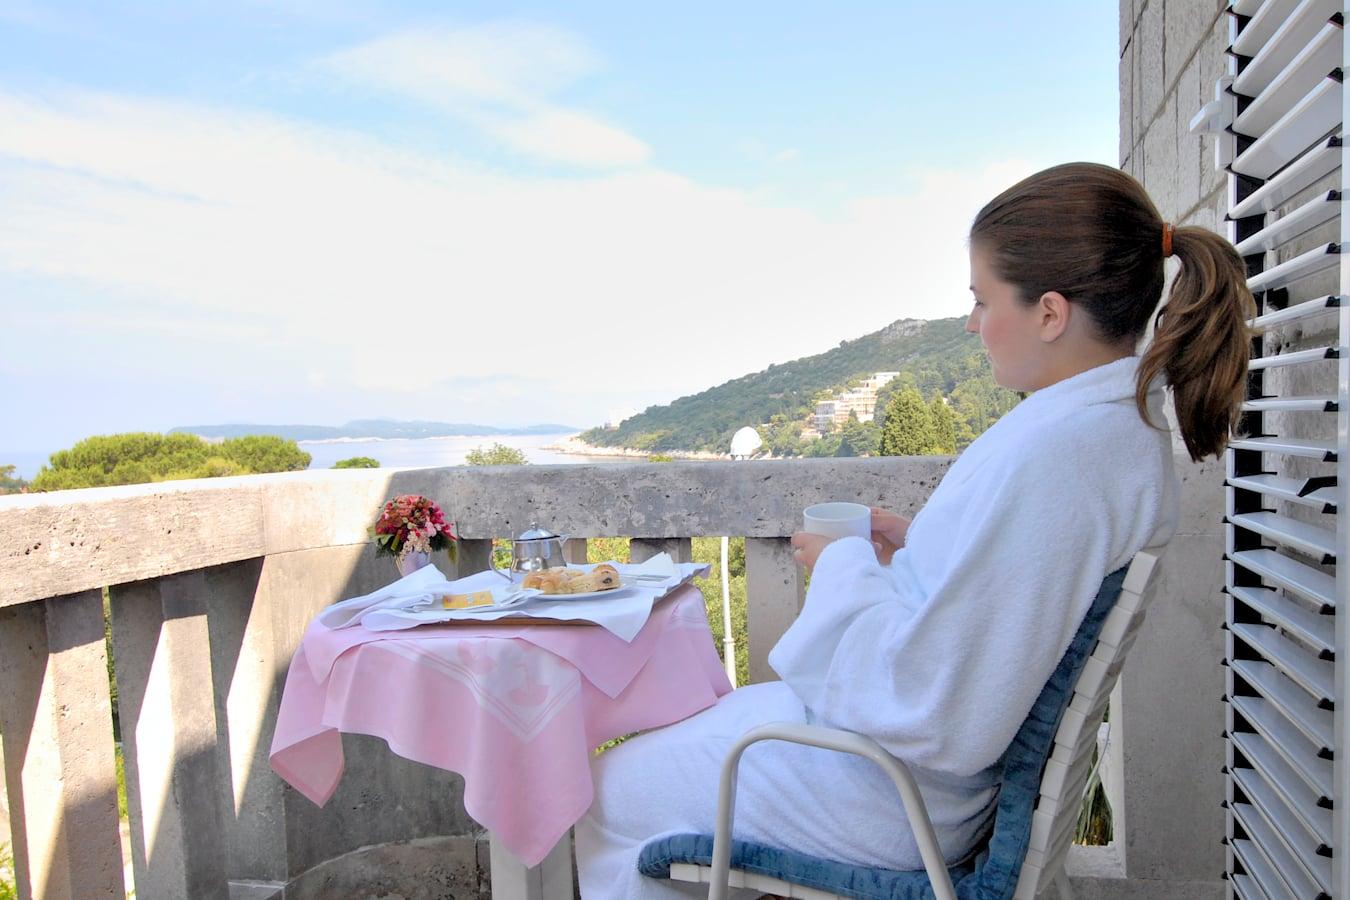 komodor-hotel-rooms-balcony-seaview-dubrovnik.jpg